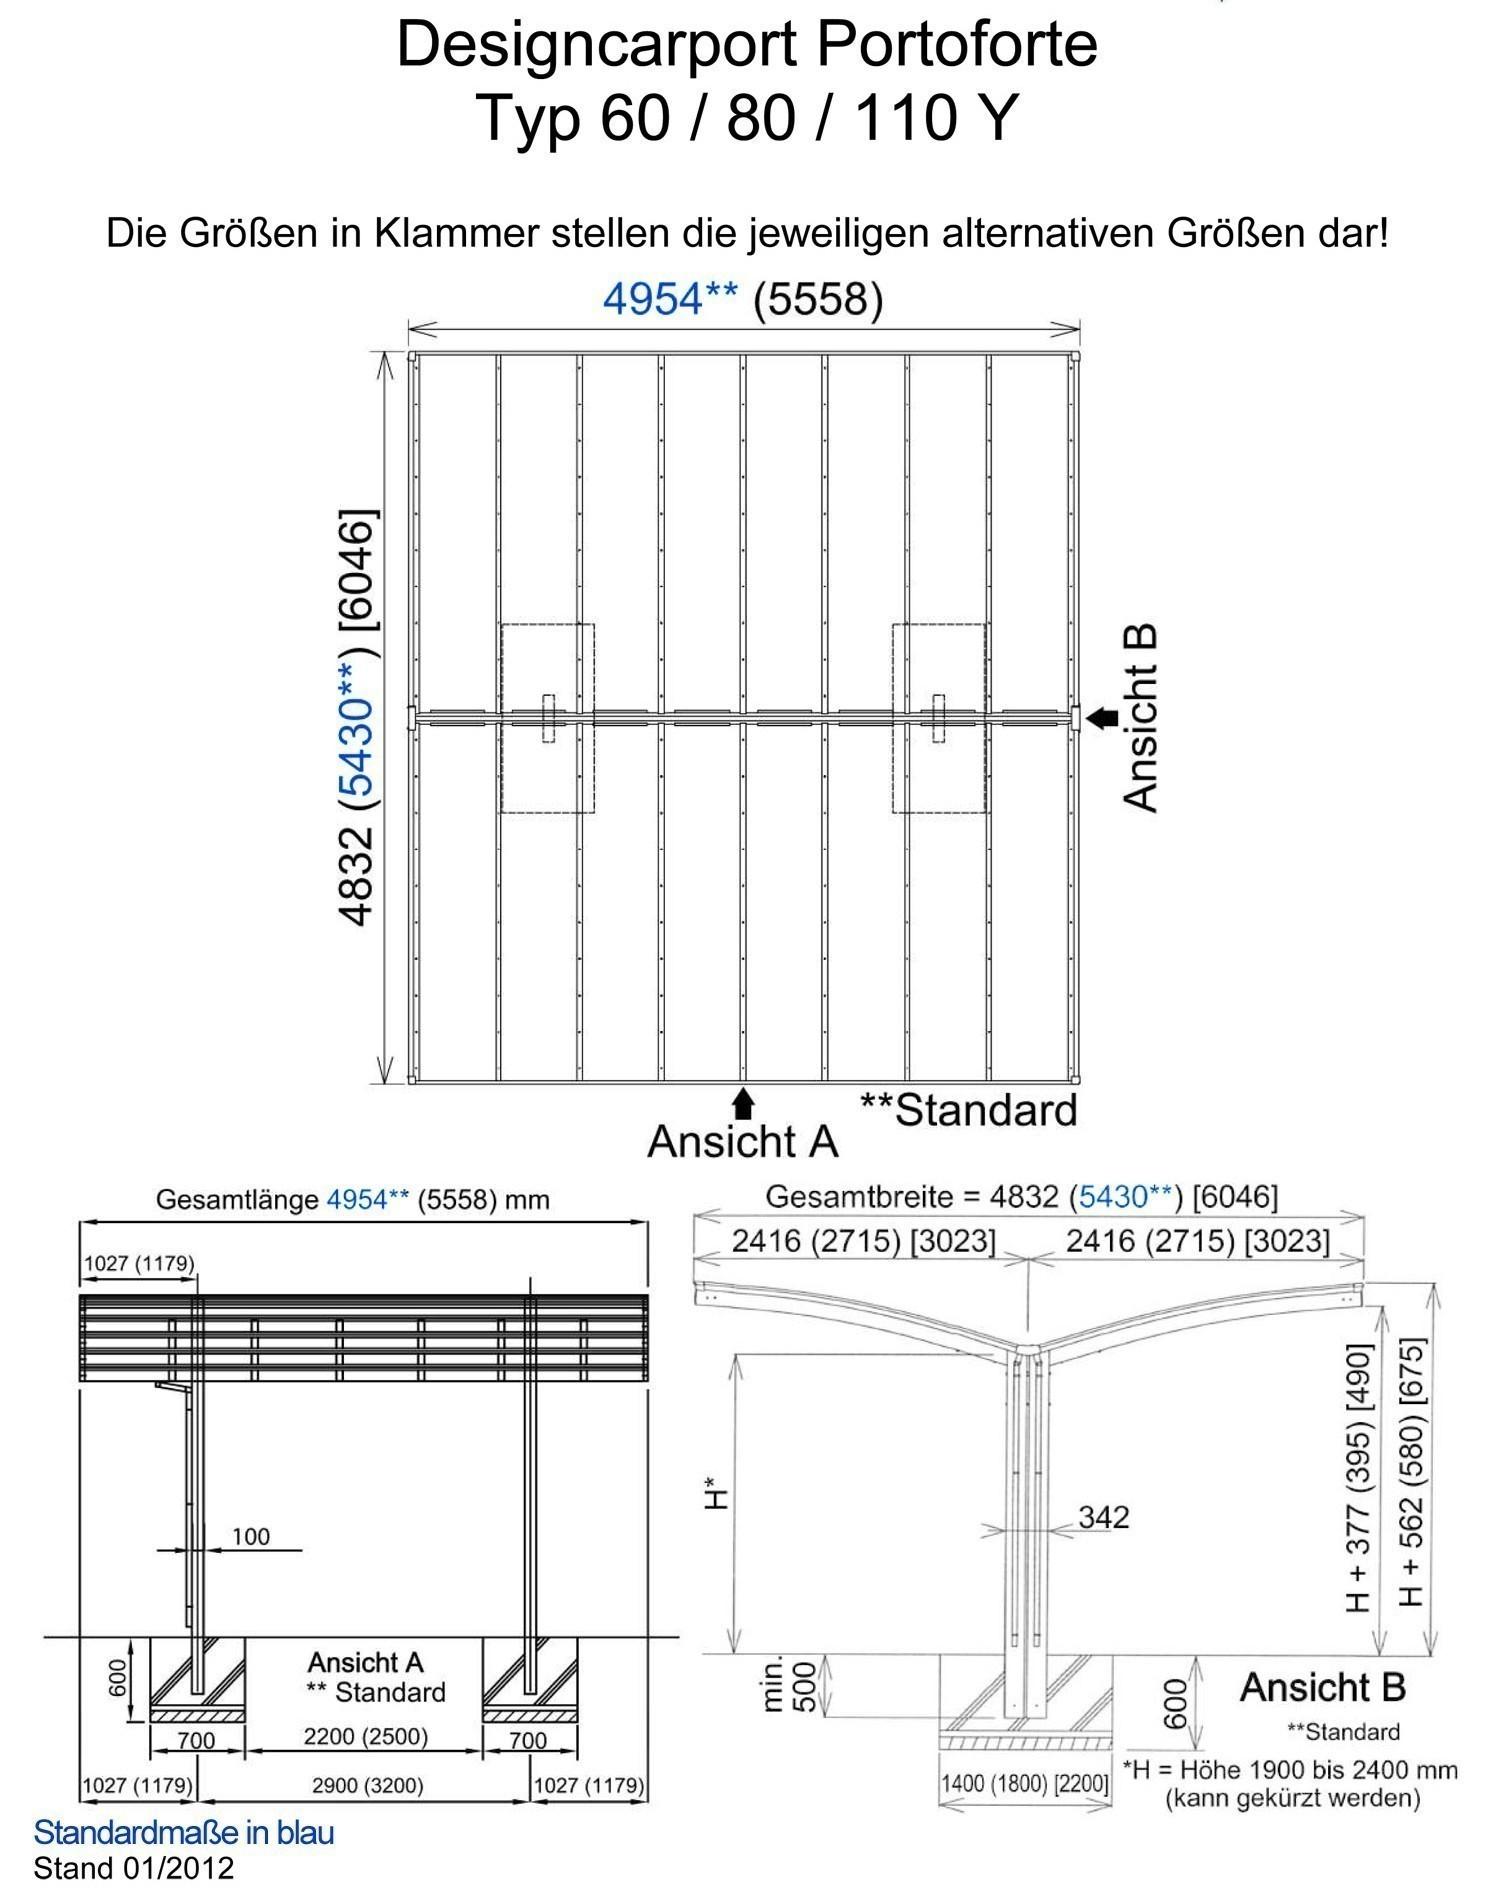 Carport XIMAX Portoforte Alu Typ 60 Y ES 495x543x248cm Bild 2